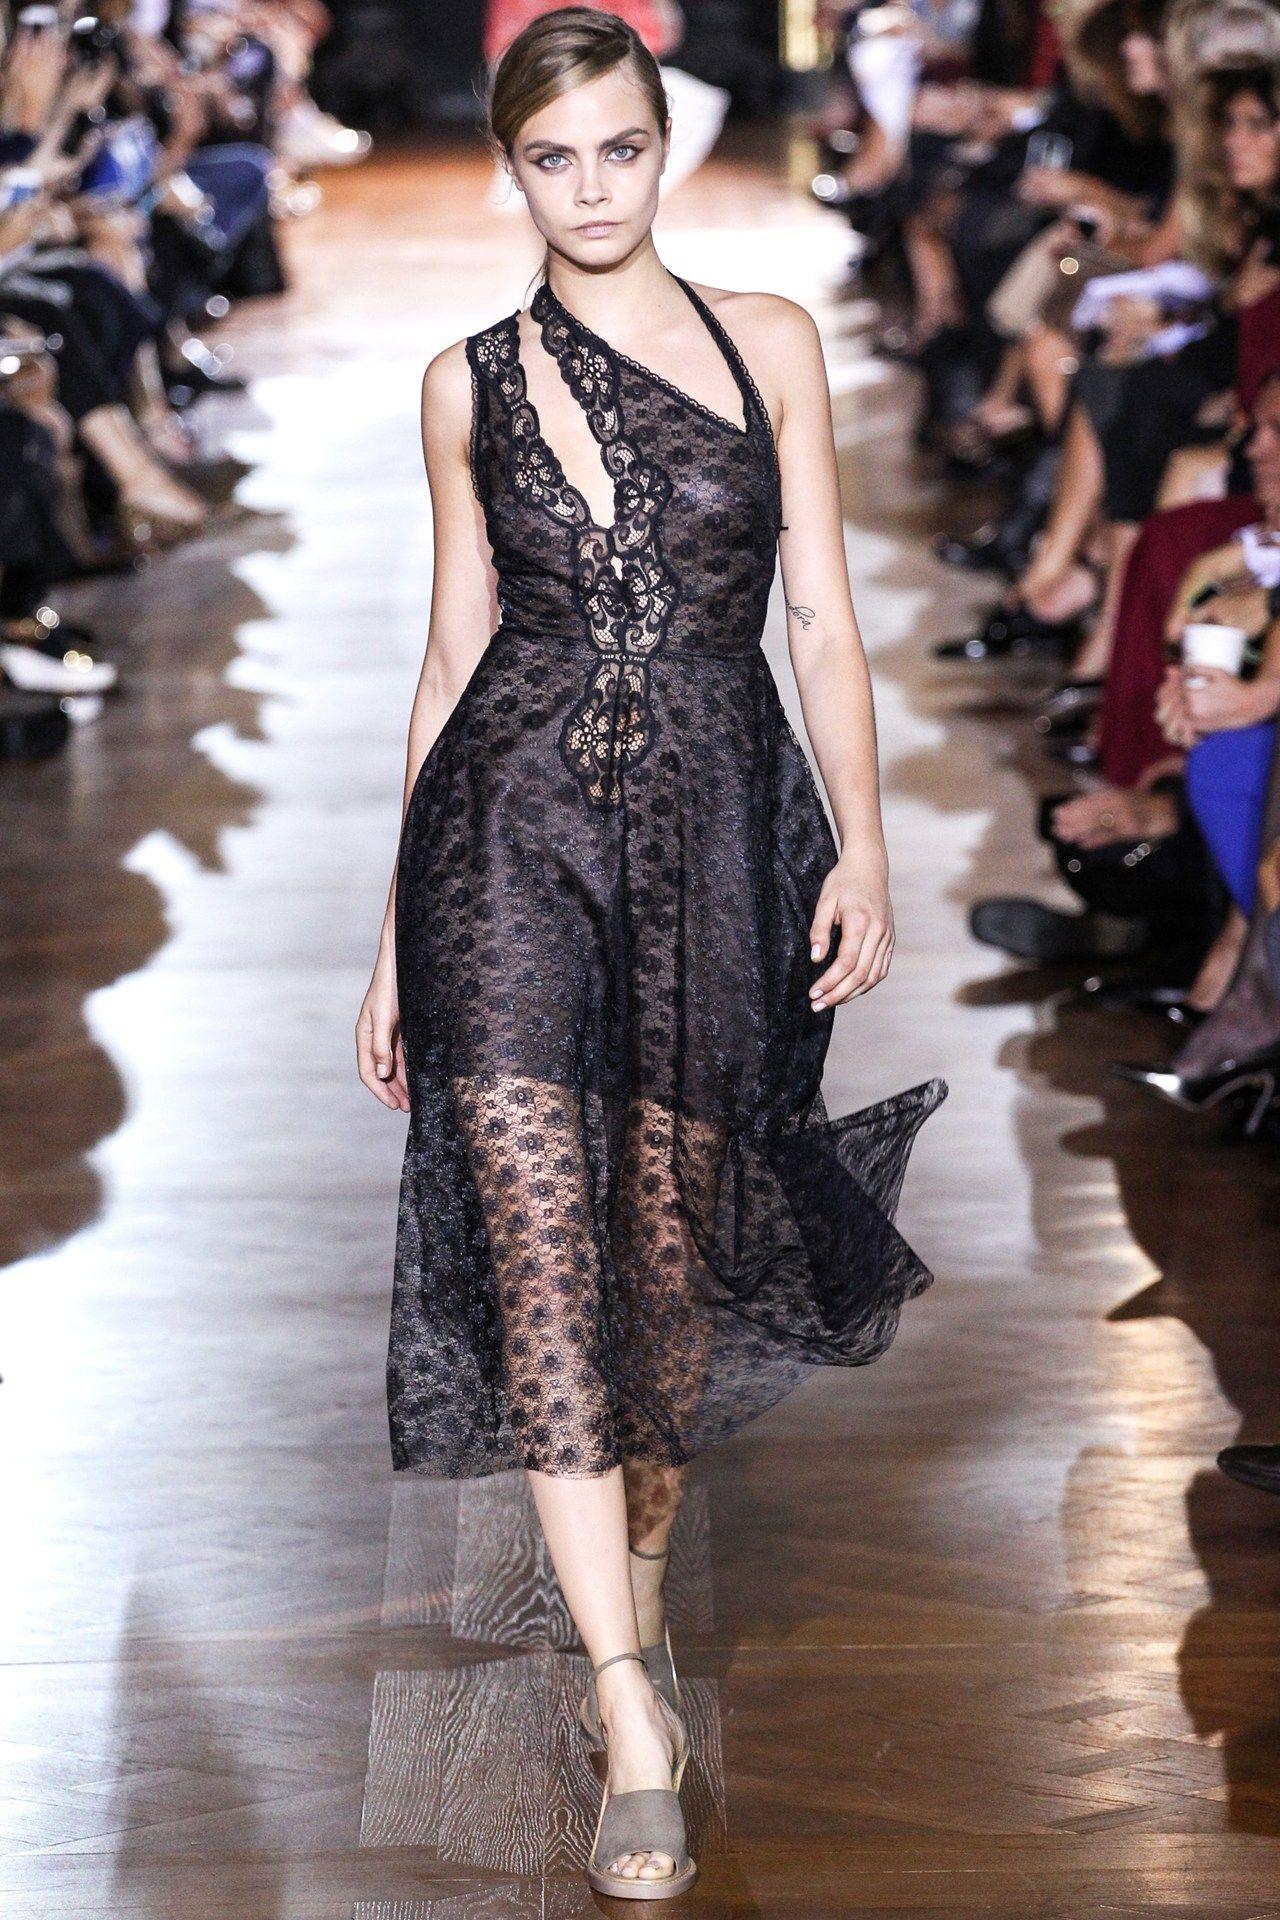 783b8712e7a Cara Delevingne Model Profile - Catwalk Looks-Stella McCartney